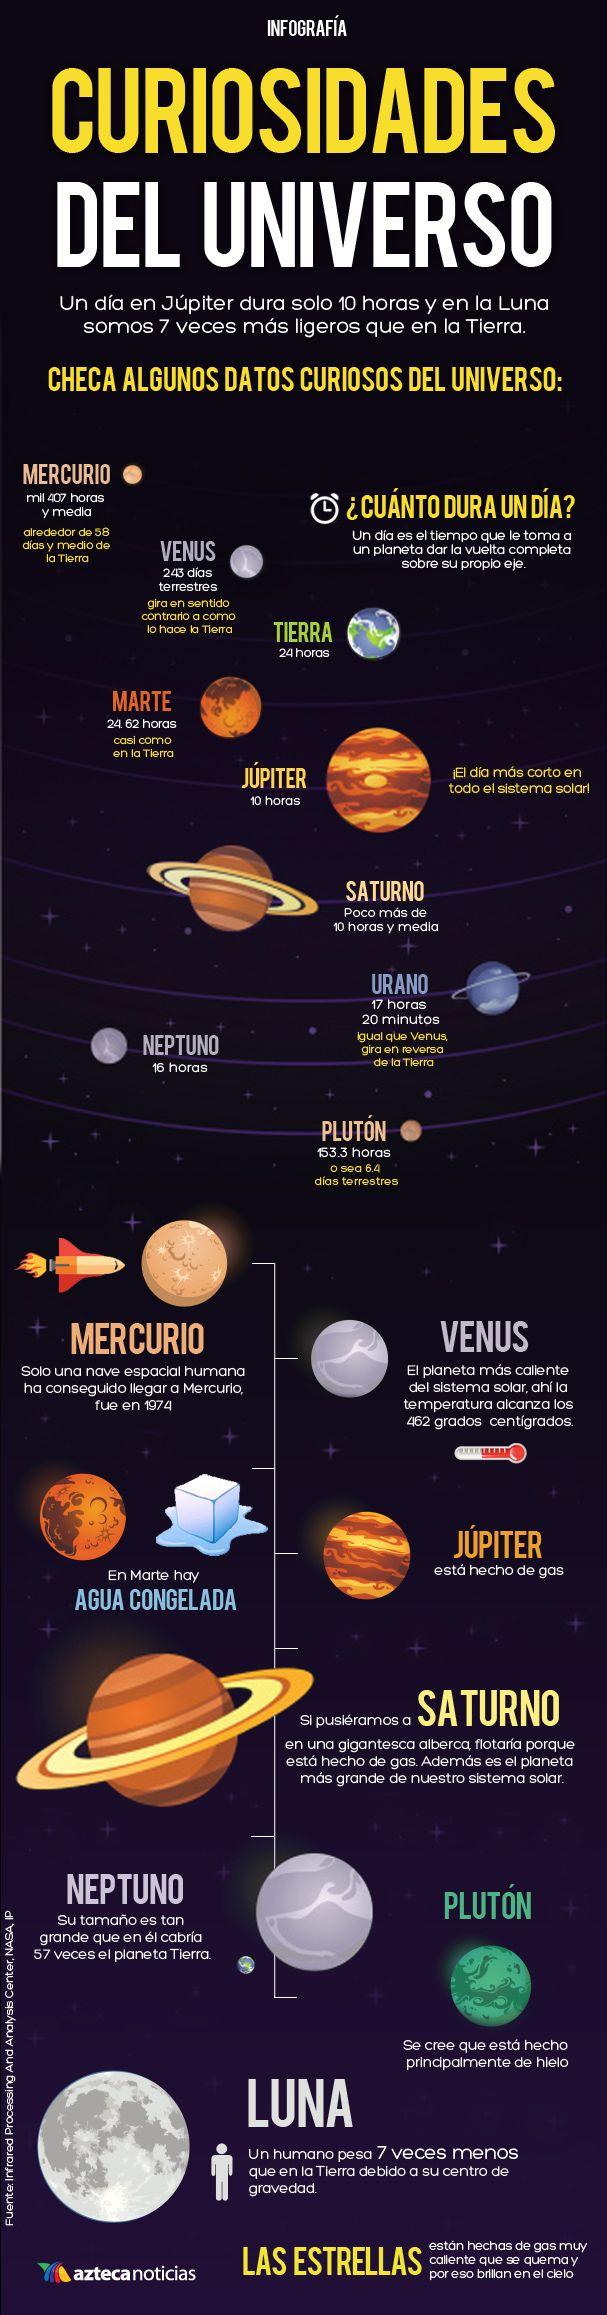 Curiosidades del Universo #infografia